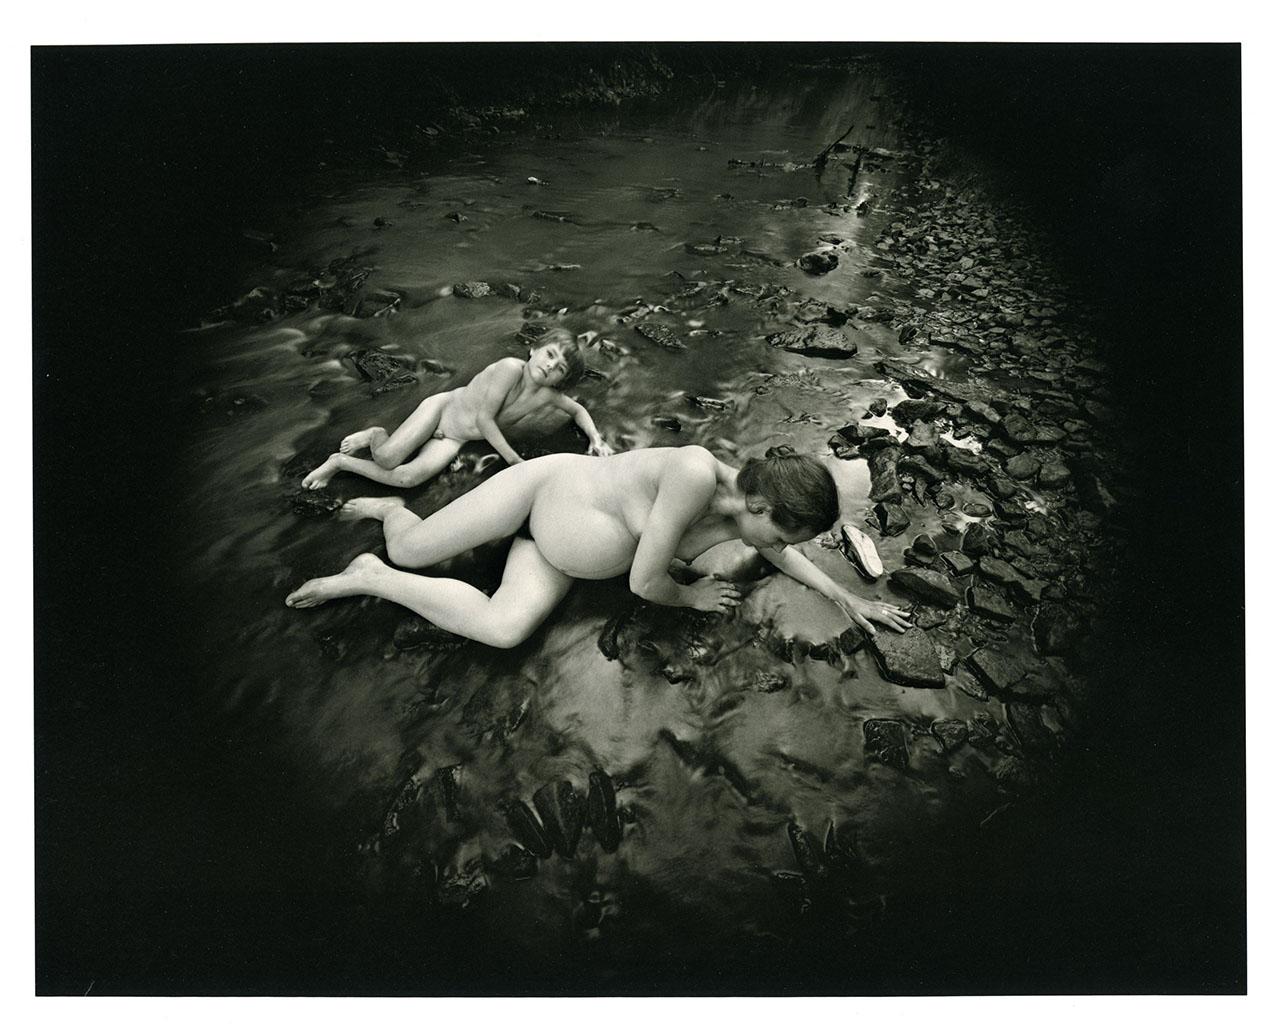 04_Emmet Gowin_Edith et Elijah, Newtown (Pennsylvanie), 1974©Emmet Gowin, Courtesy Pace MacGill Gallery, New York